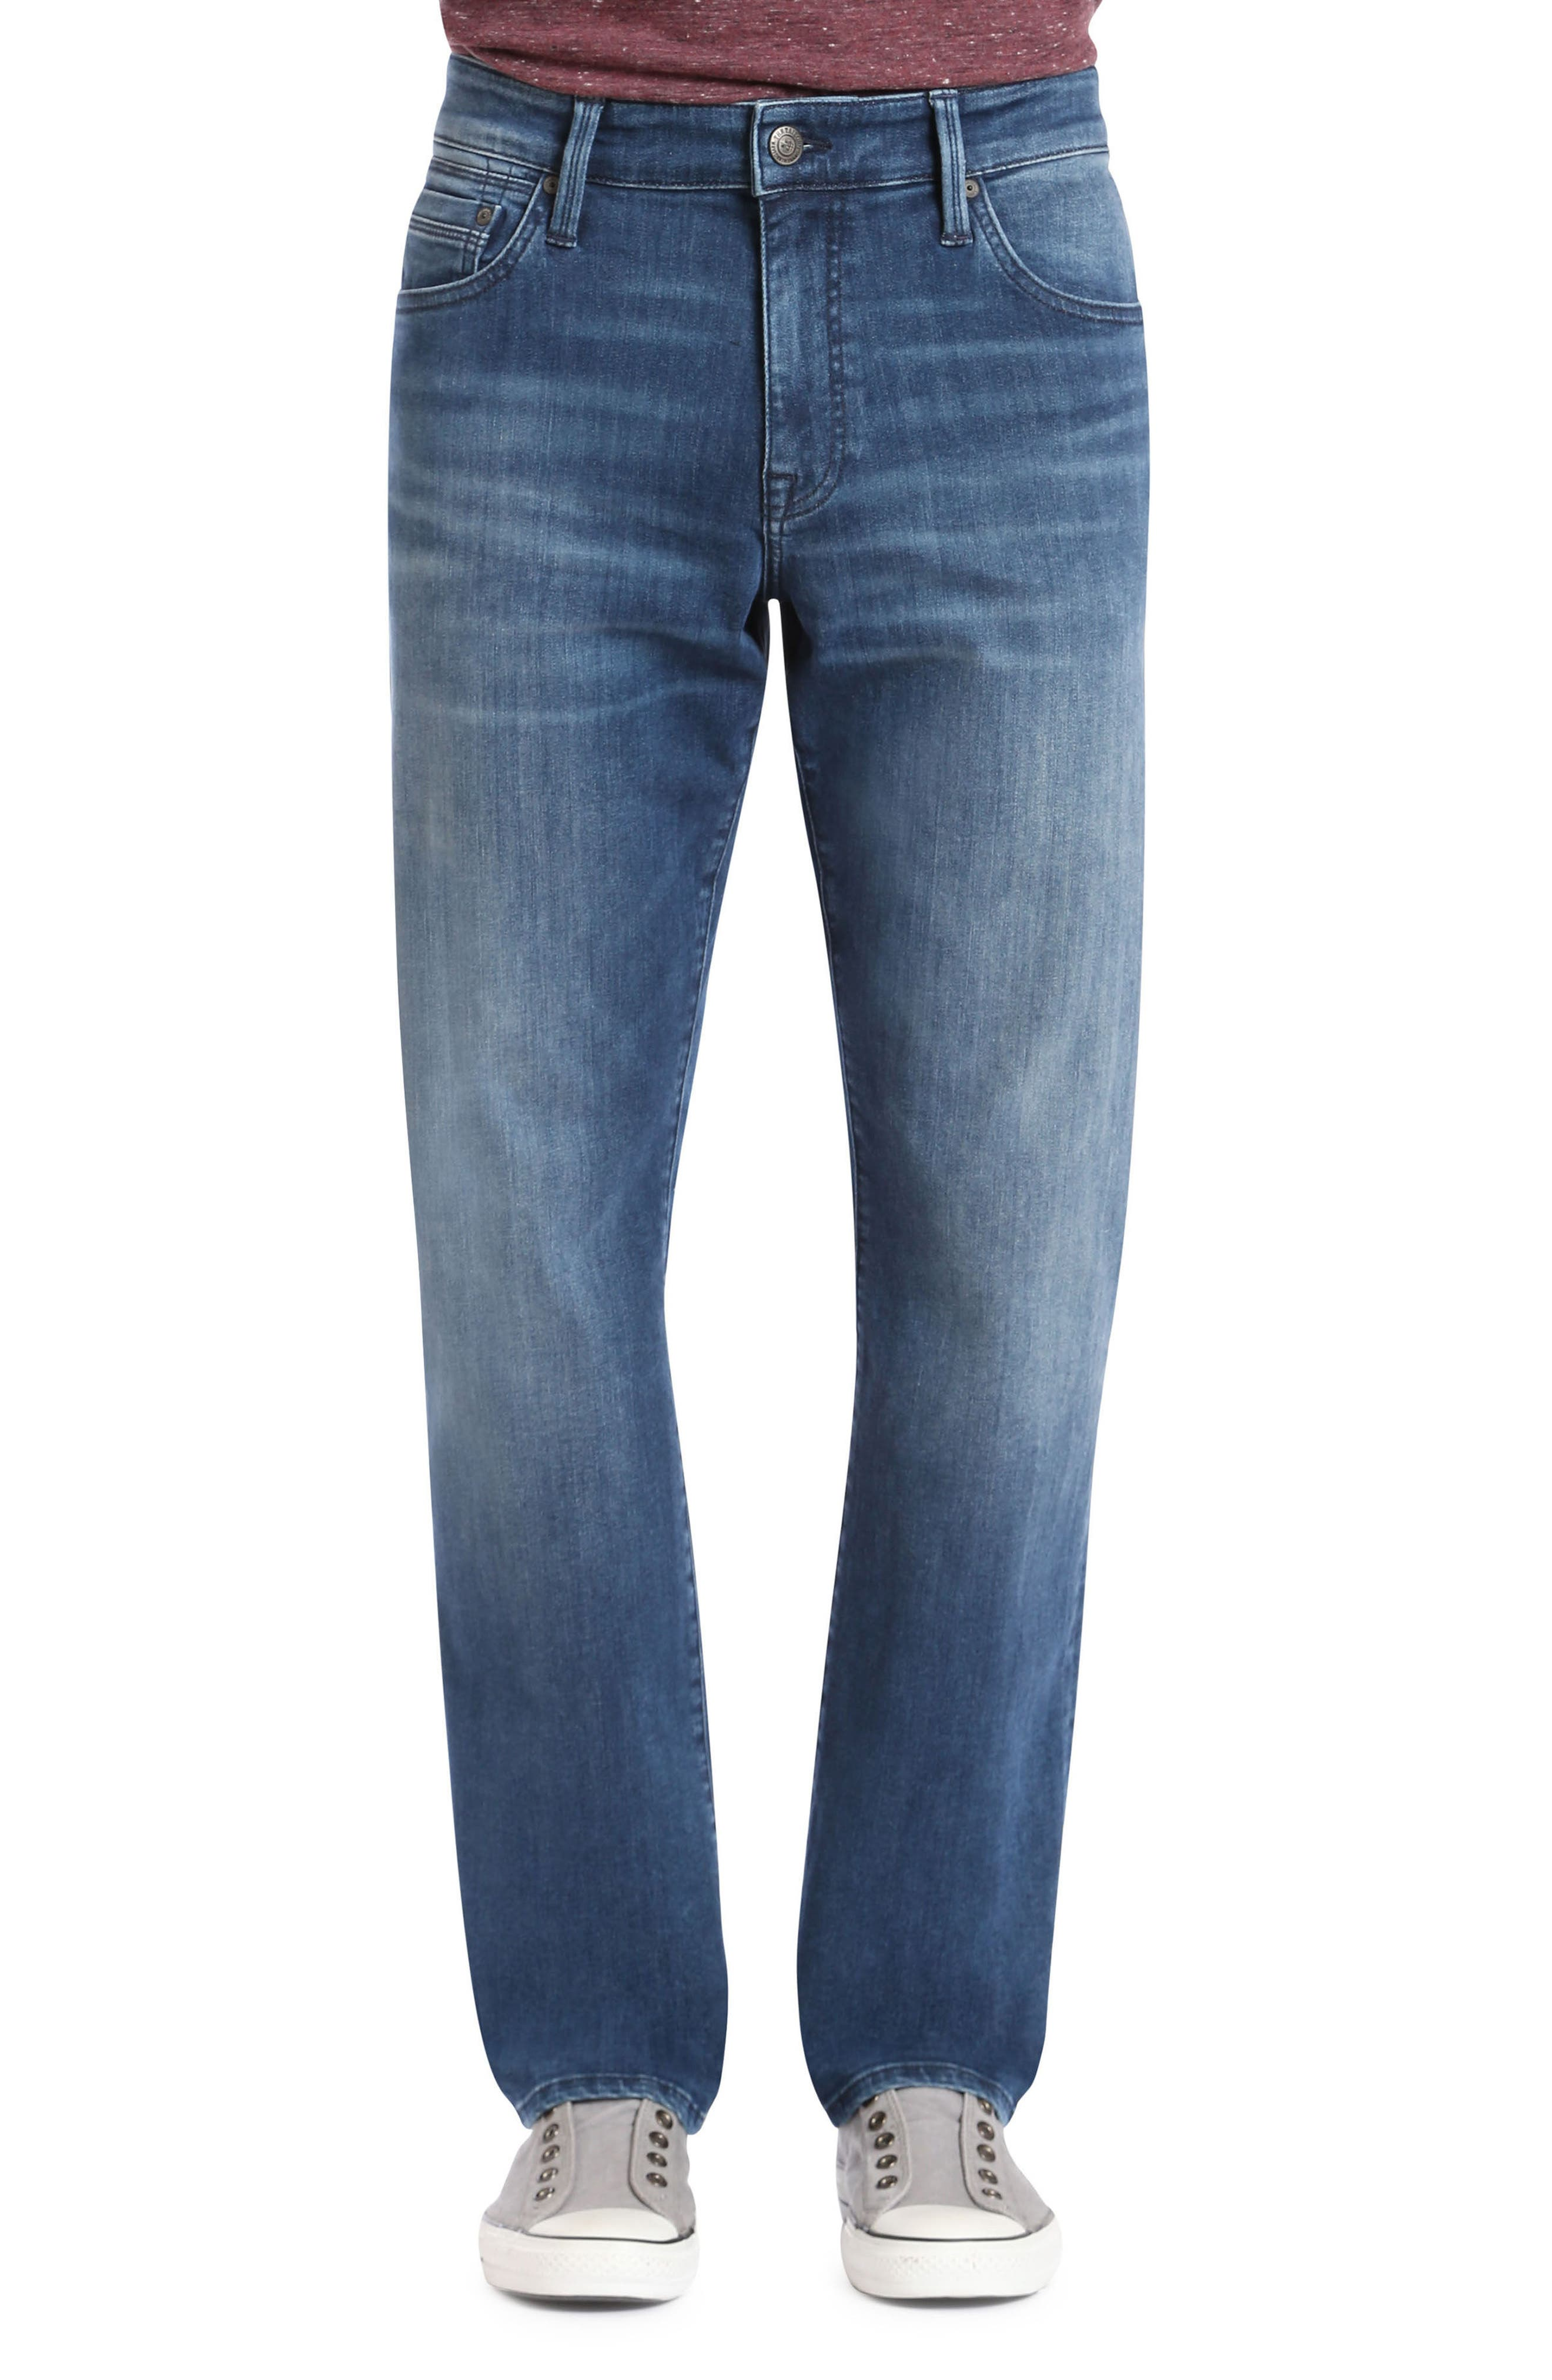 Myles Straight Leg Jeans,                         Main,                         color, 400